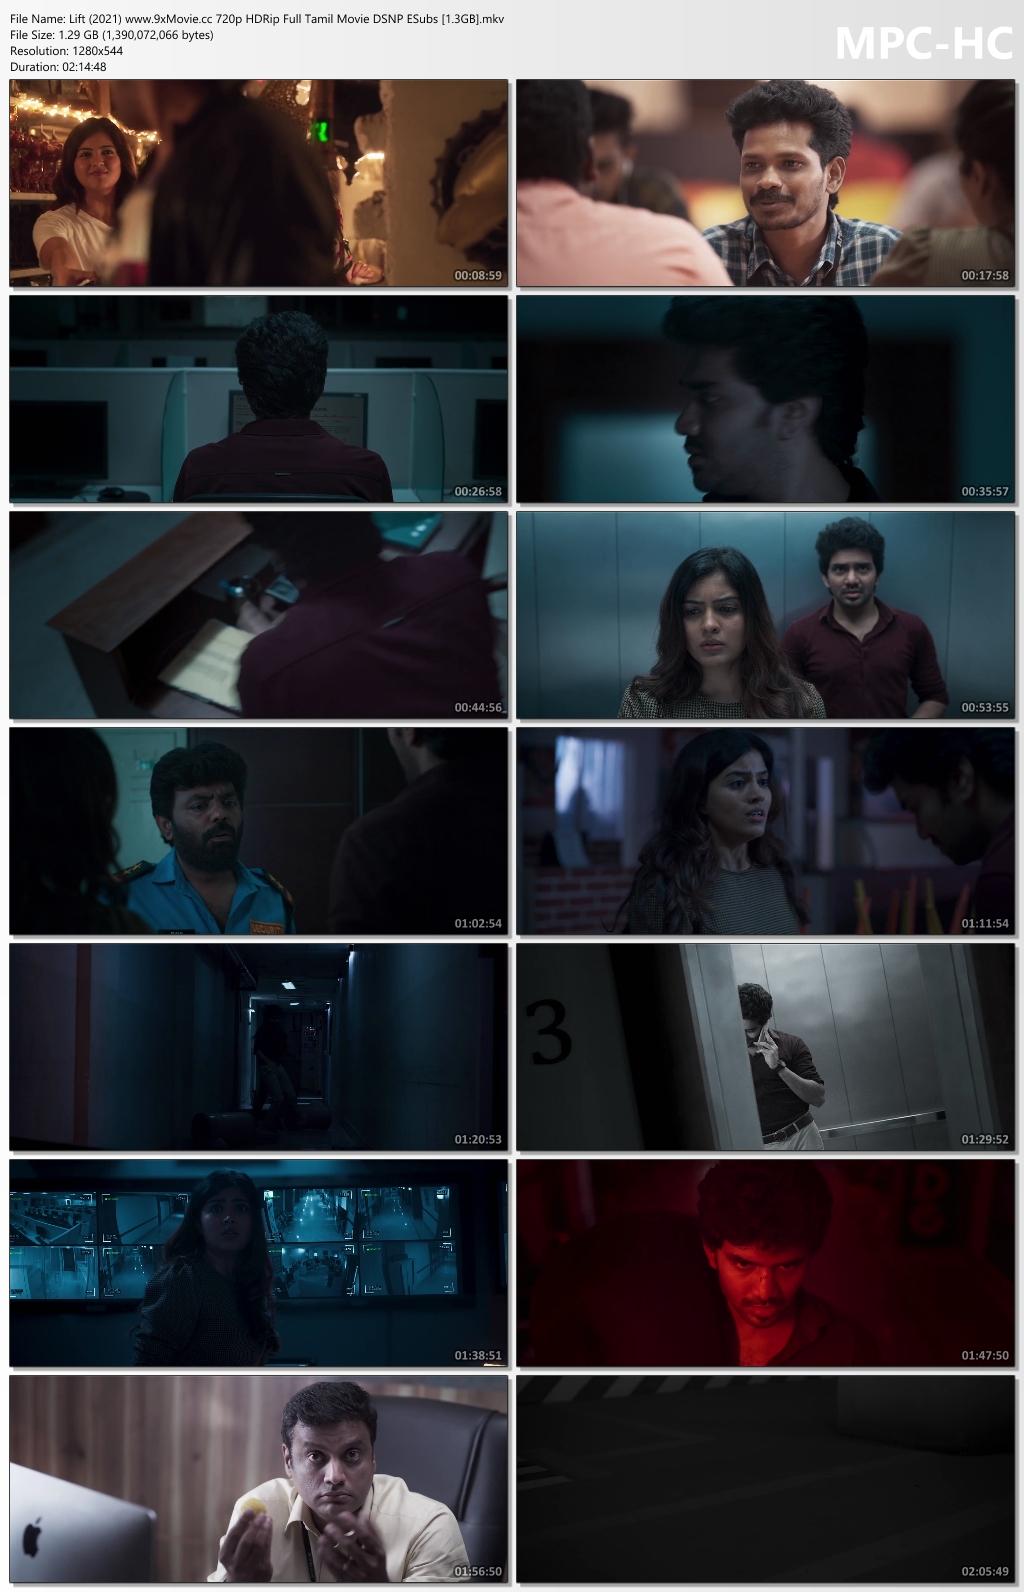 Lift-2021-www-9x-Movie-cc-720p-HDRip-Full-Tamil-Movie-DSNP-ESubs-1-3-GB-mkv